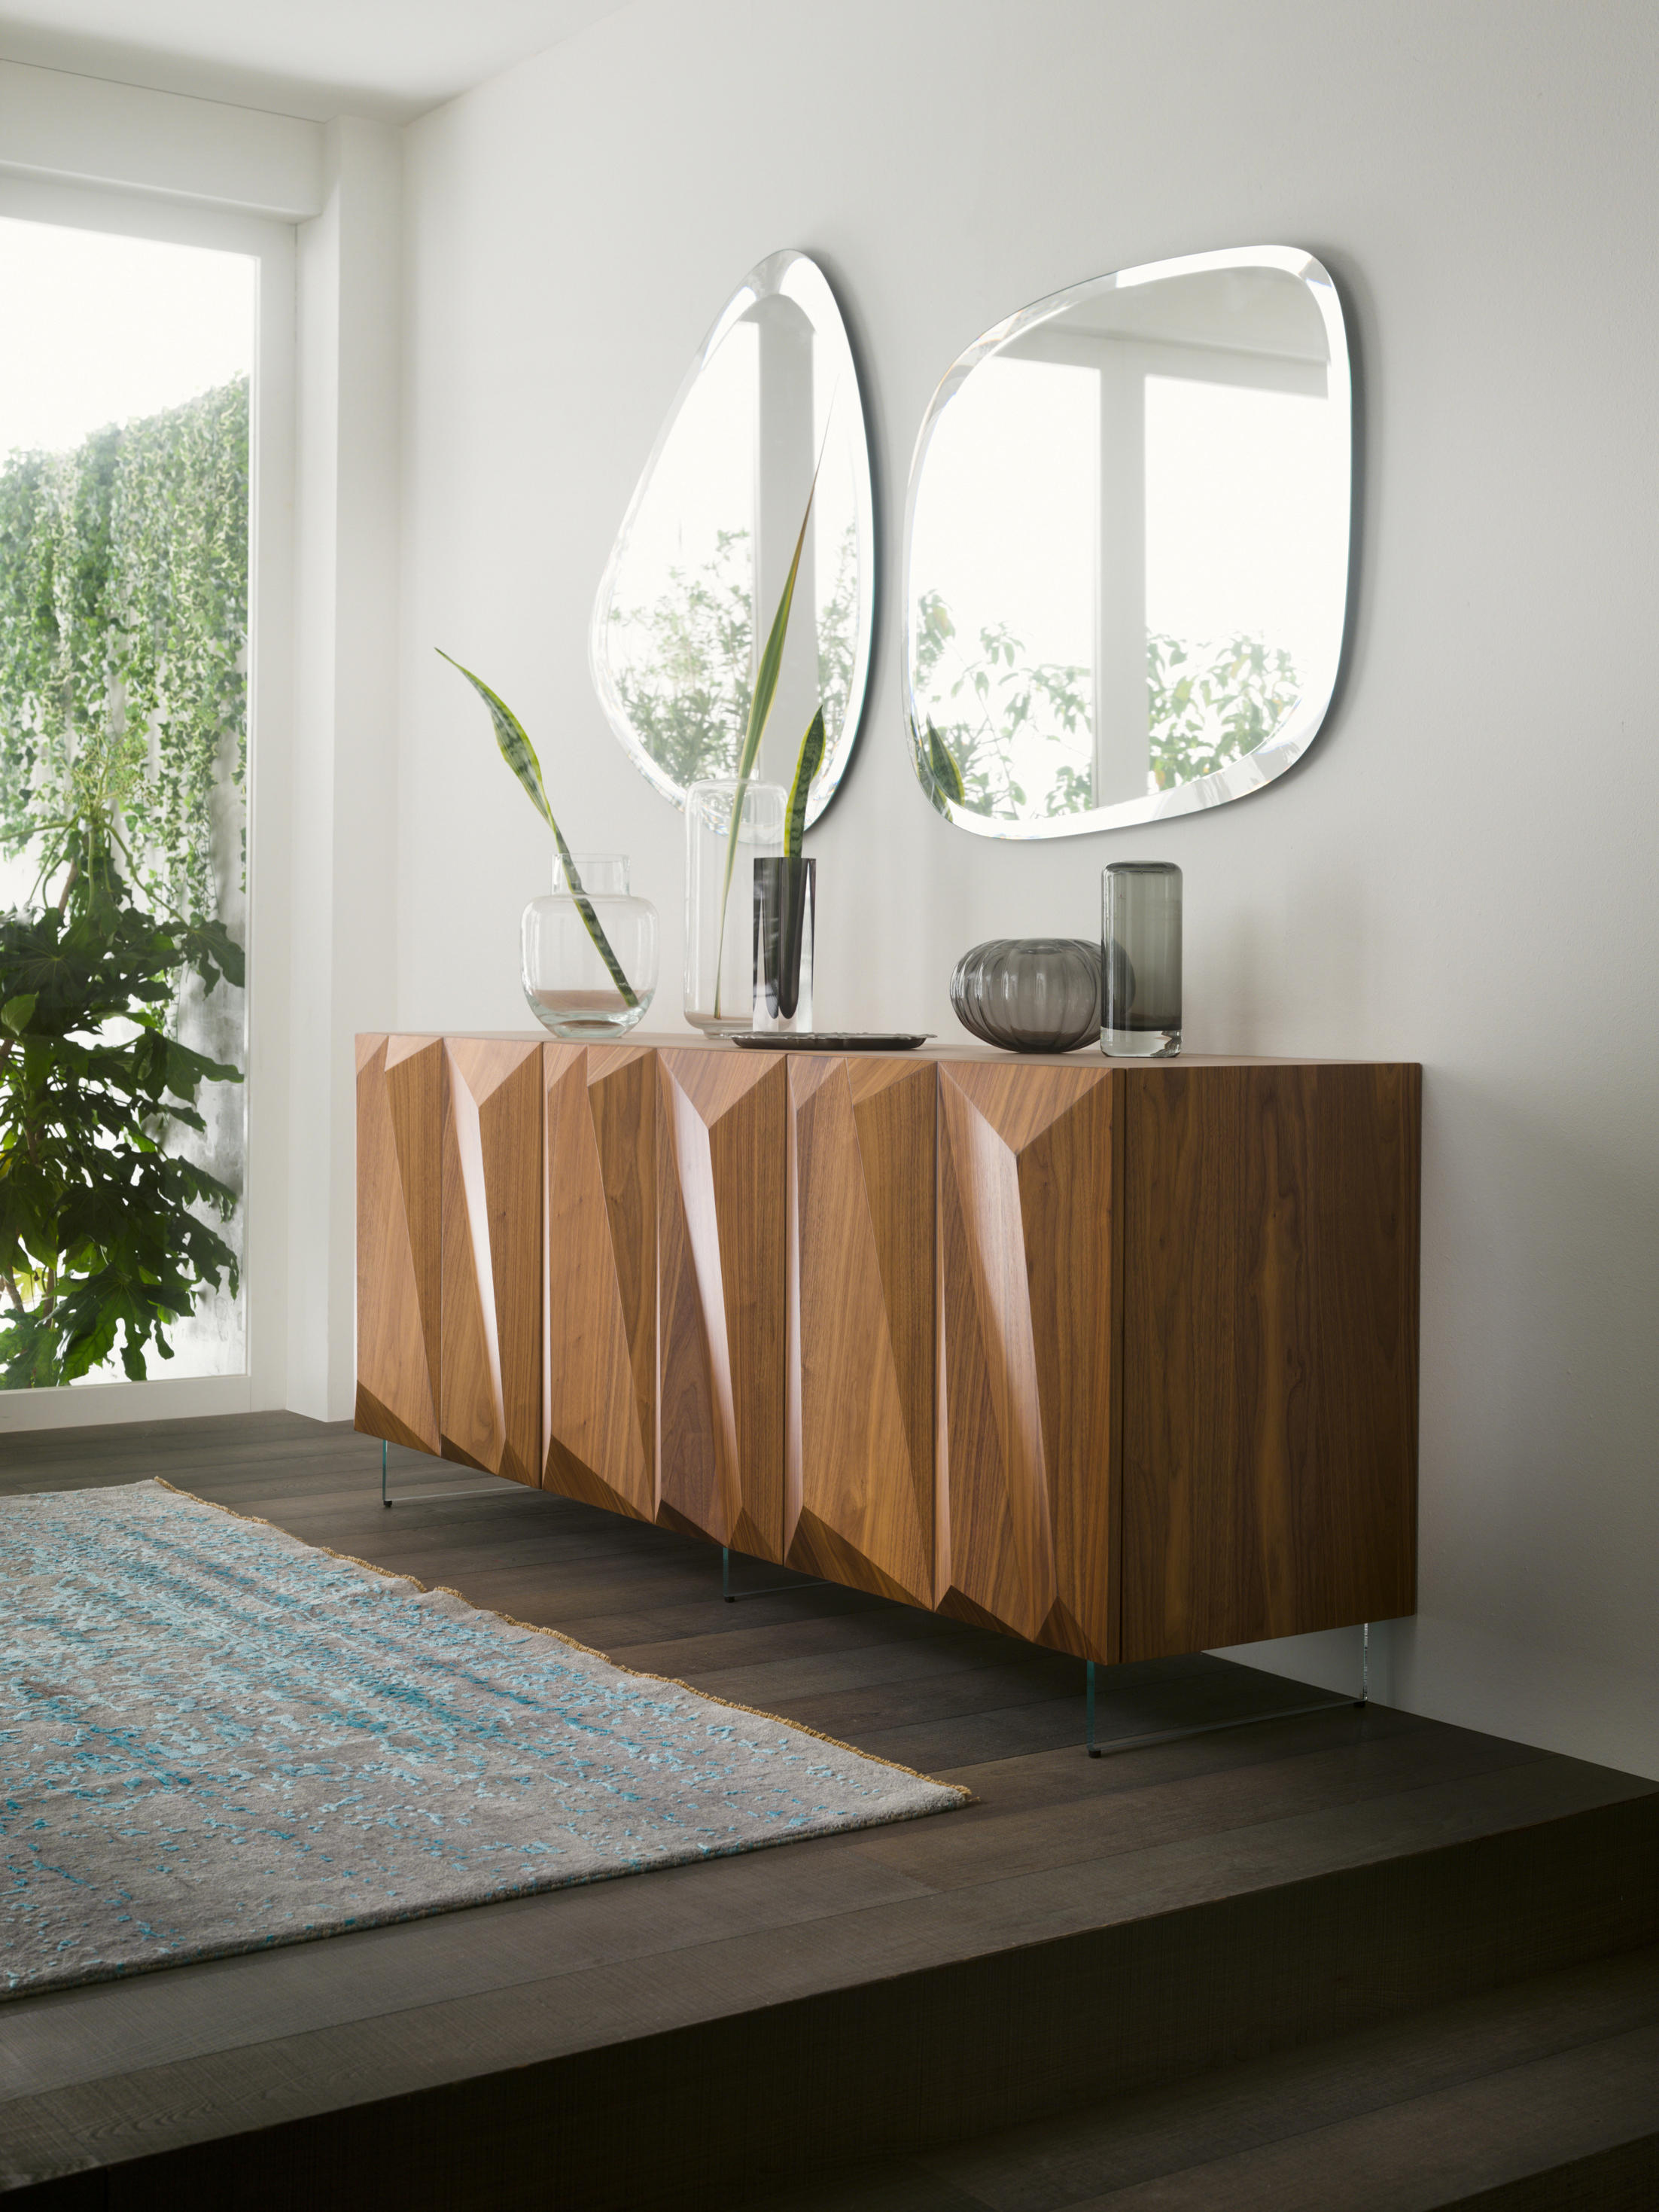 Quartz Madia Cabinets From Reflex Architonic